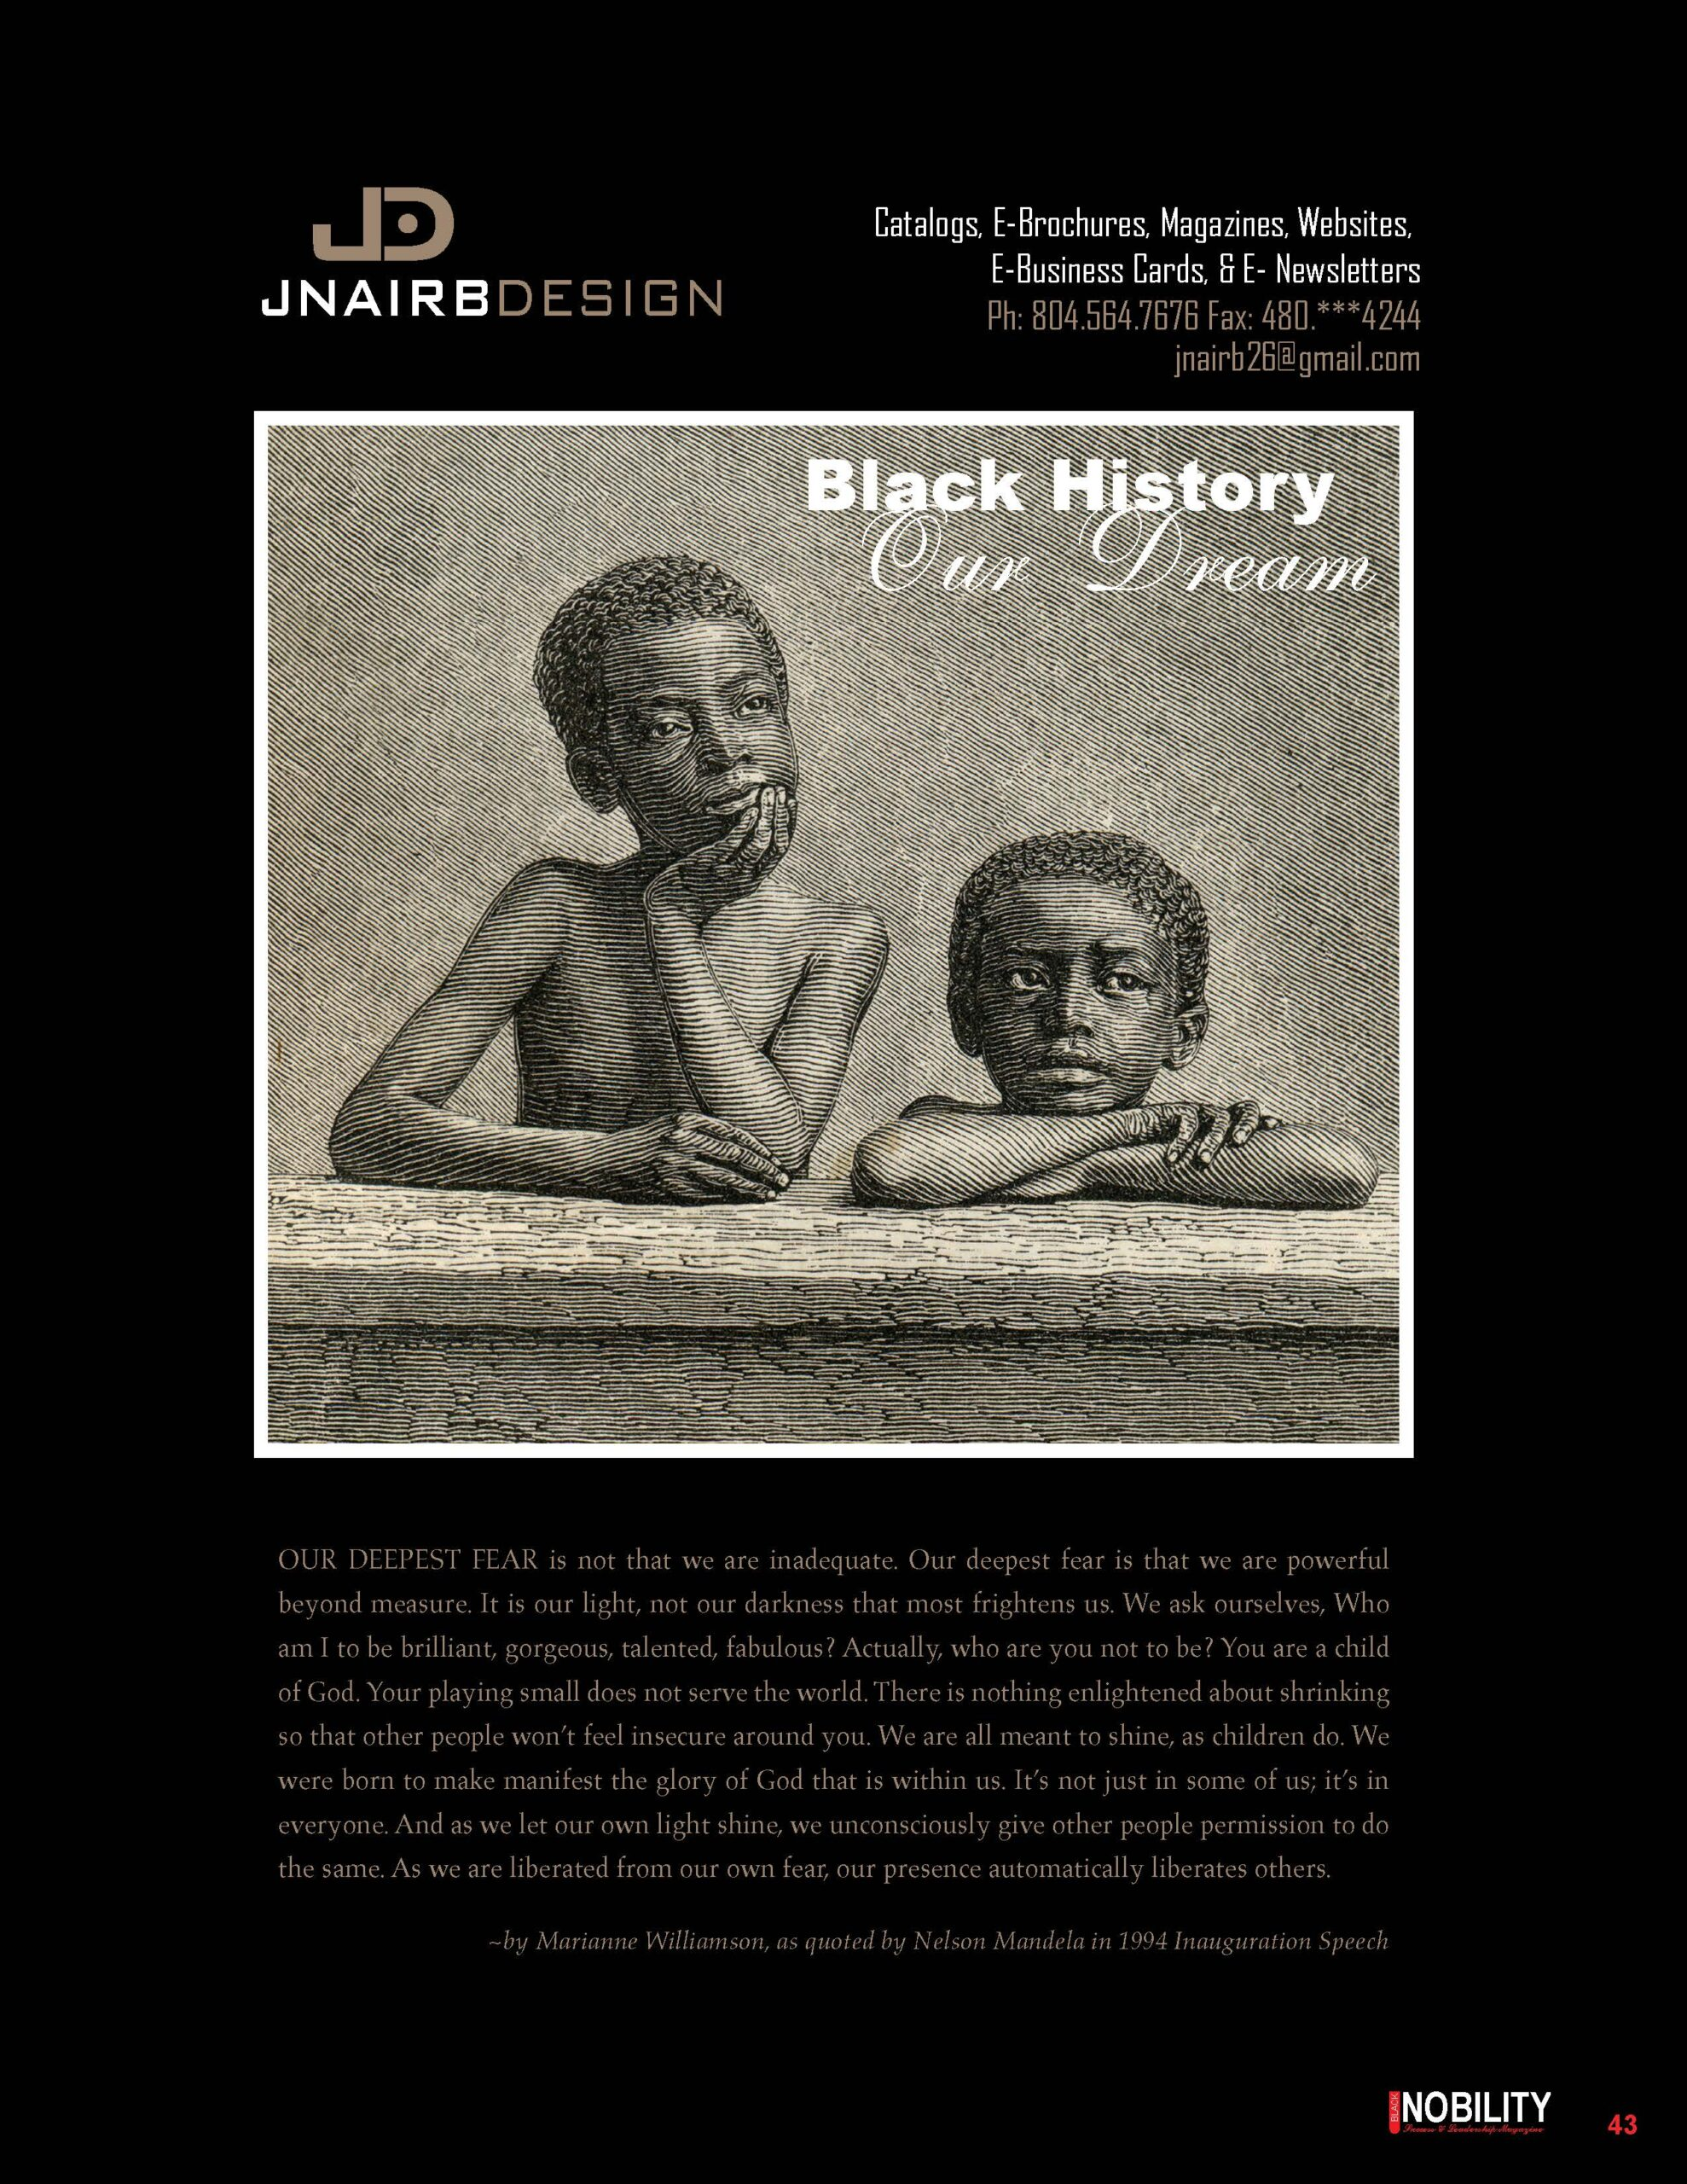 BlackHistory - Our Dream